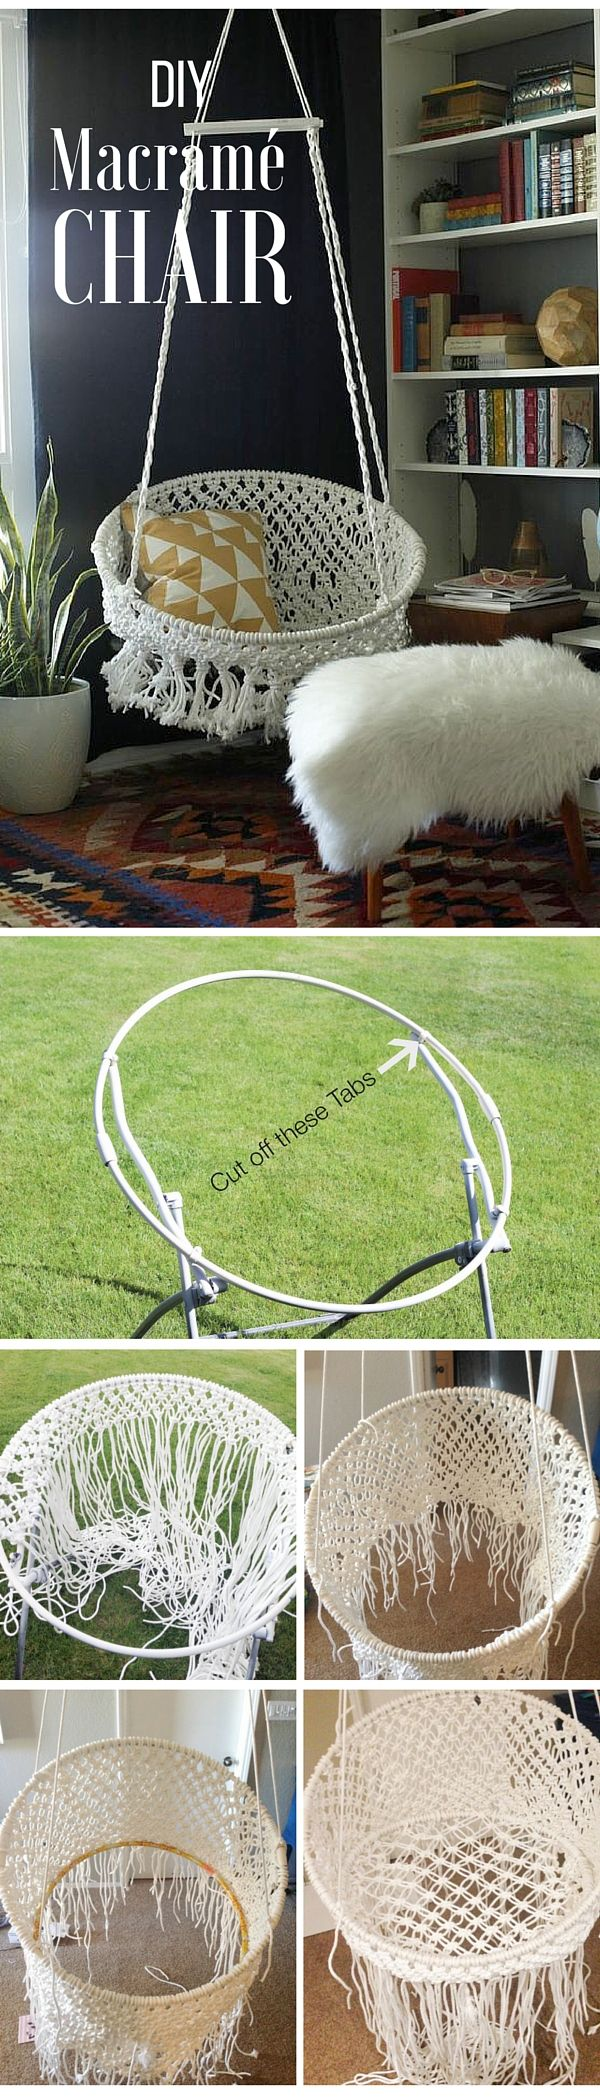 Check out the tutorial: #DIY Macrame Chair #crafts #decor - handmade - home decor idea Más